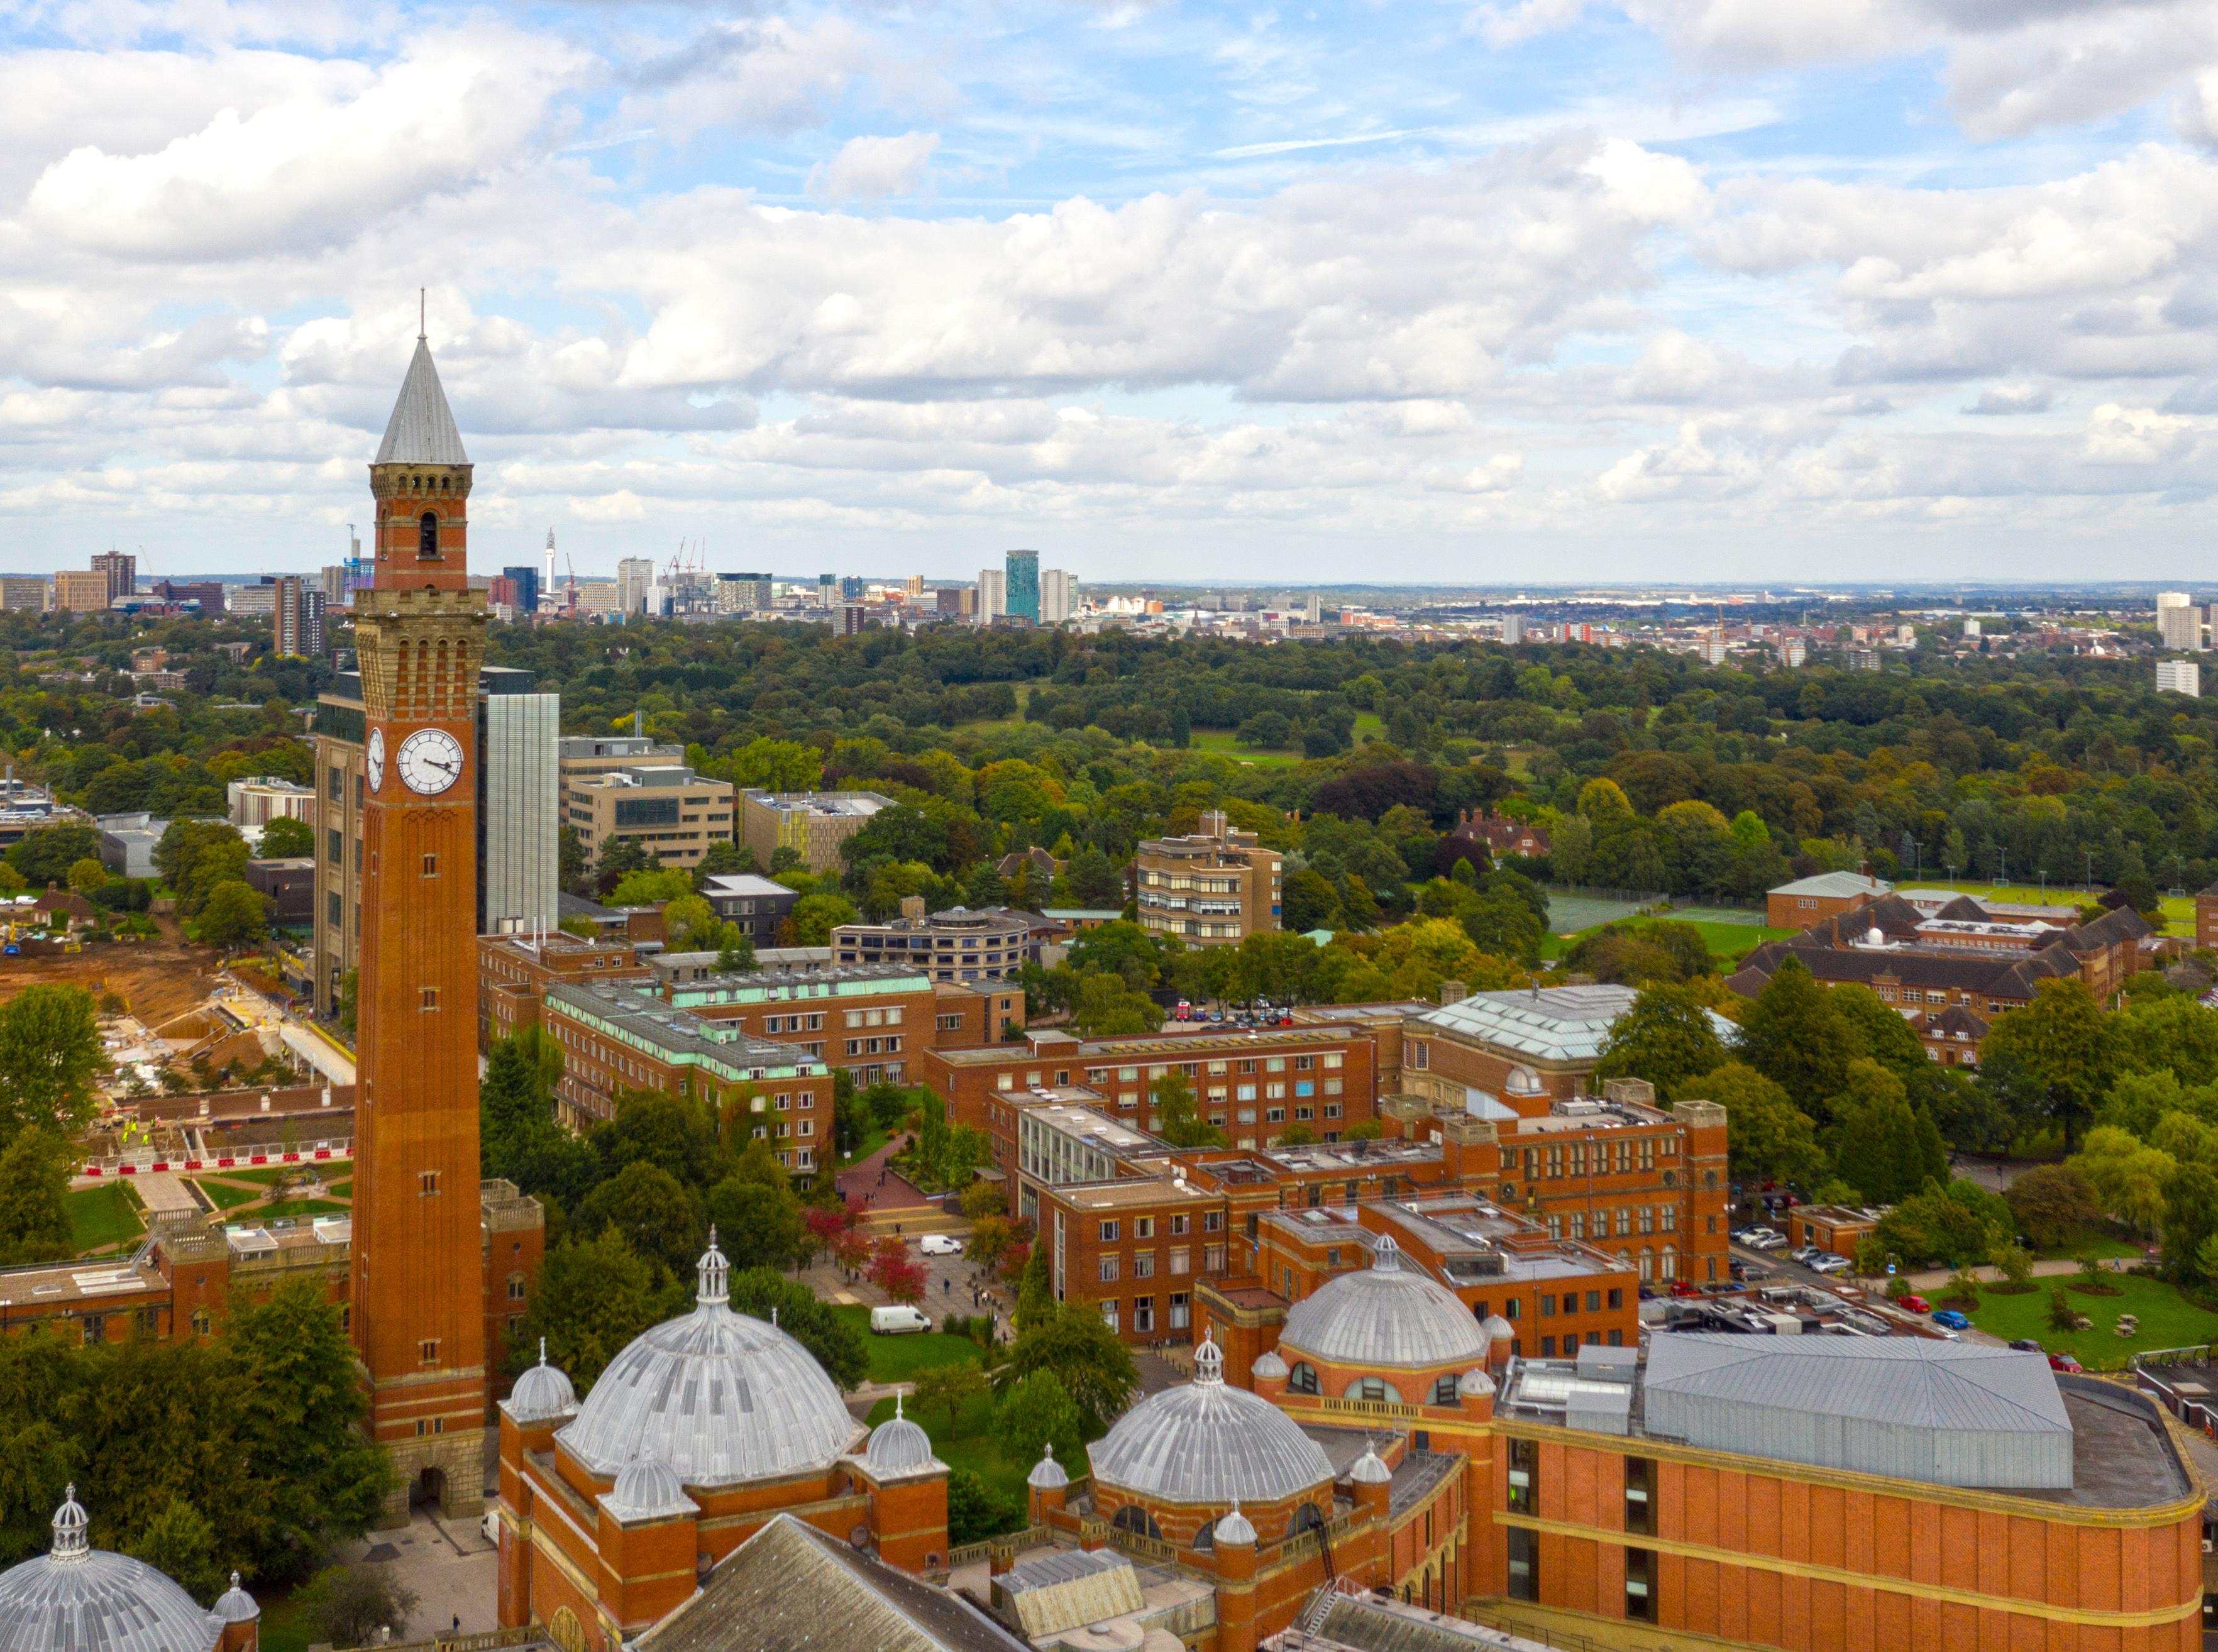 Aerial shot of the University of Birmingham and Old Joe clock tower